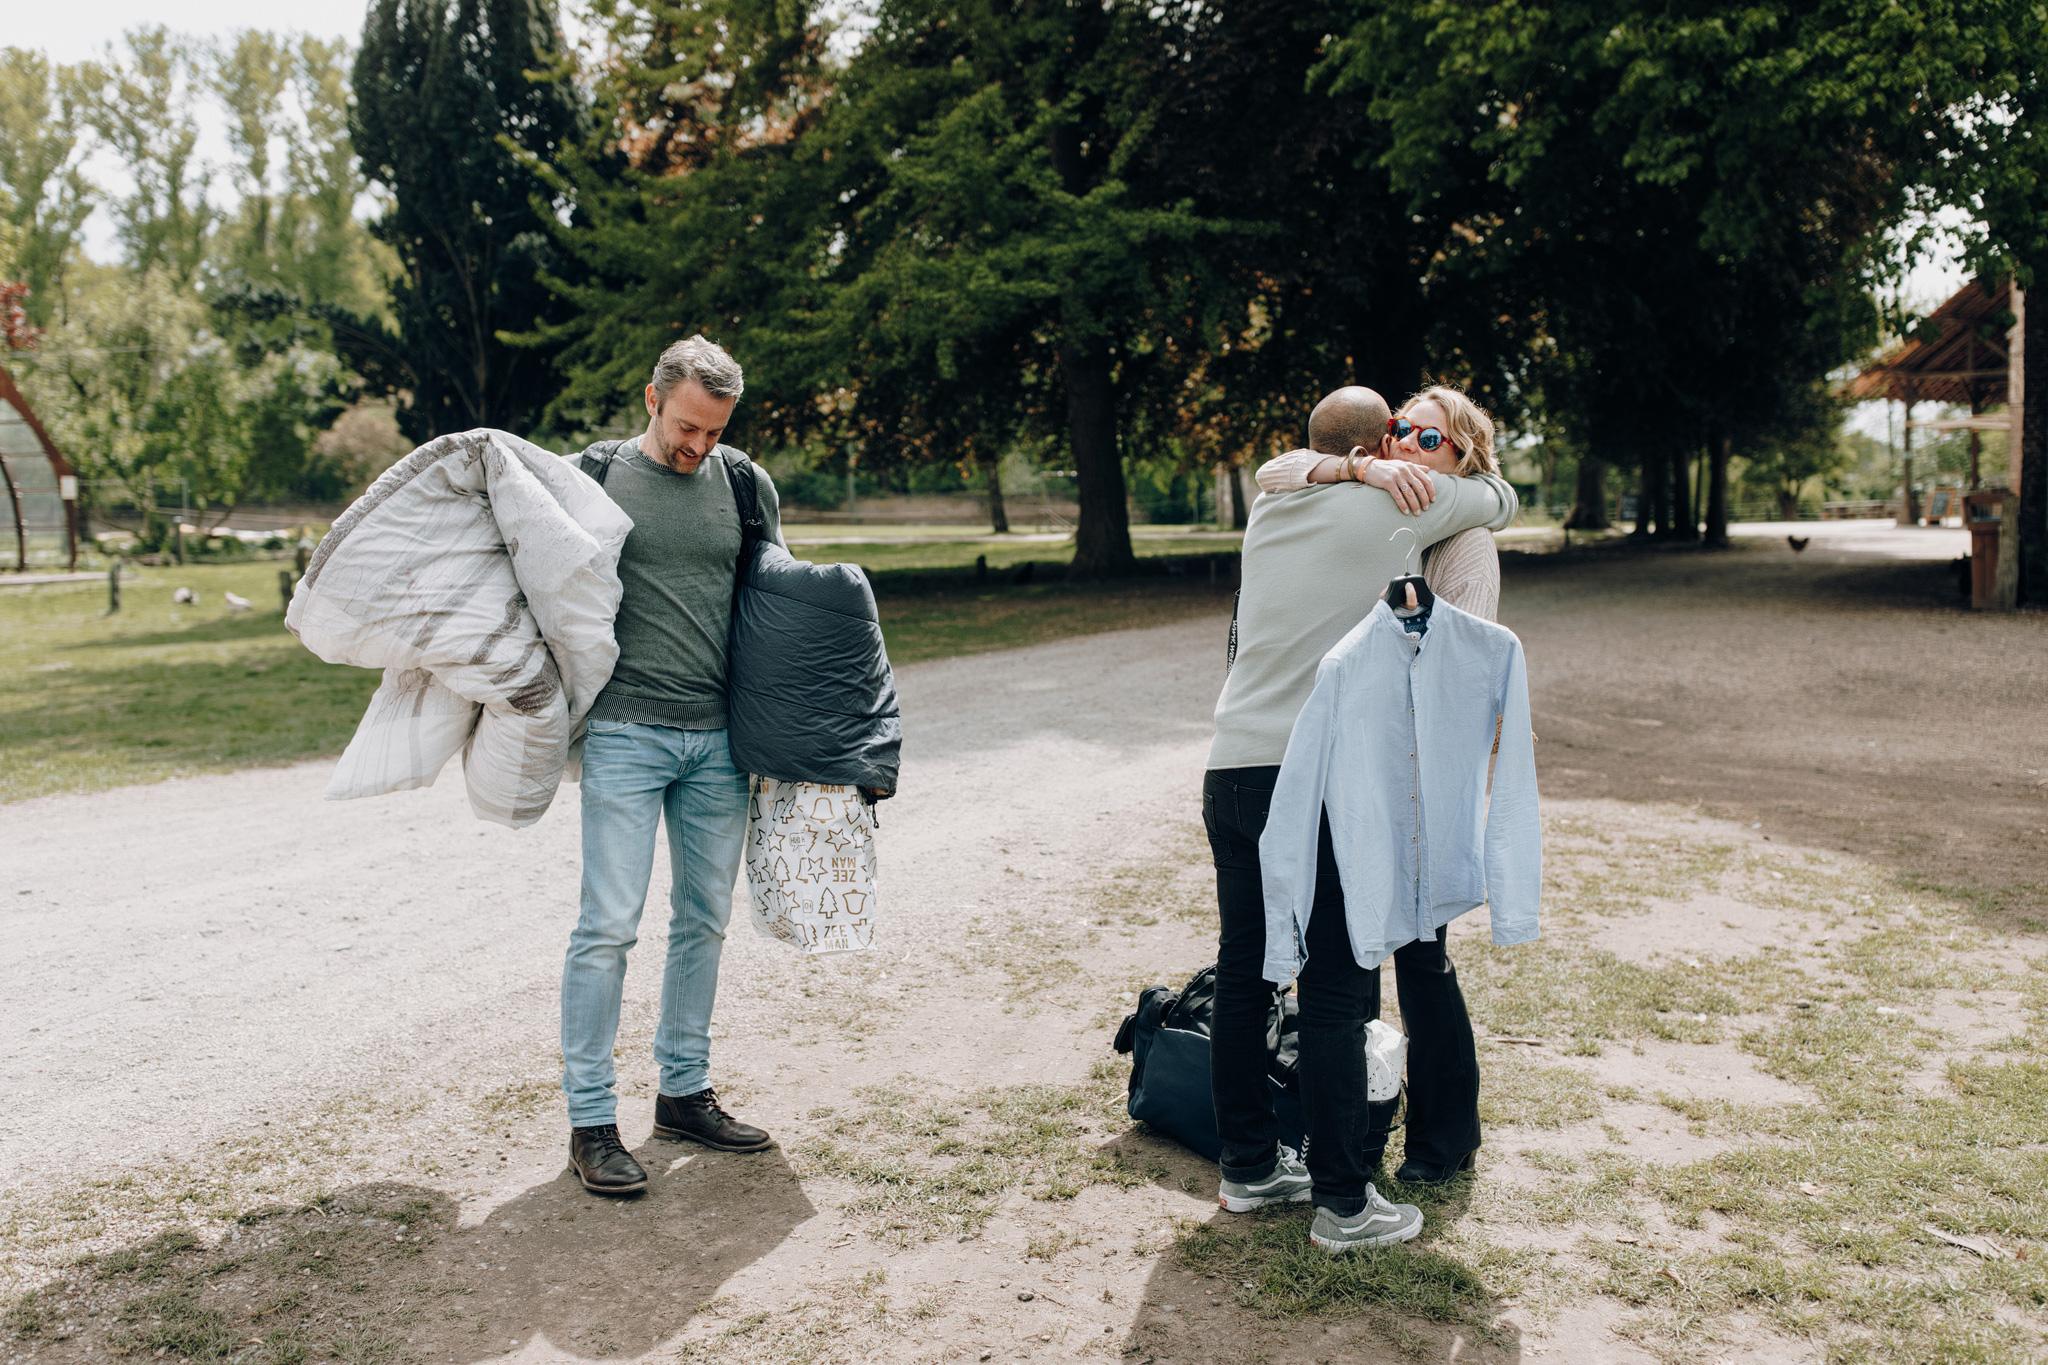 Bruidegom knuffelt gasten bij aankomst op Kloster Graefenthal